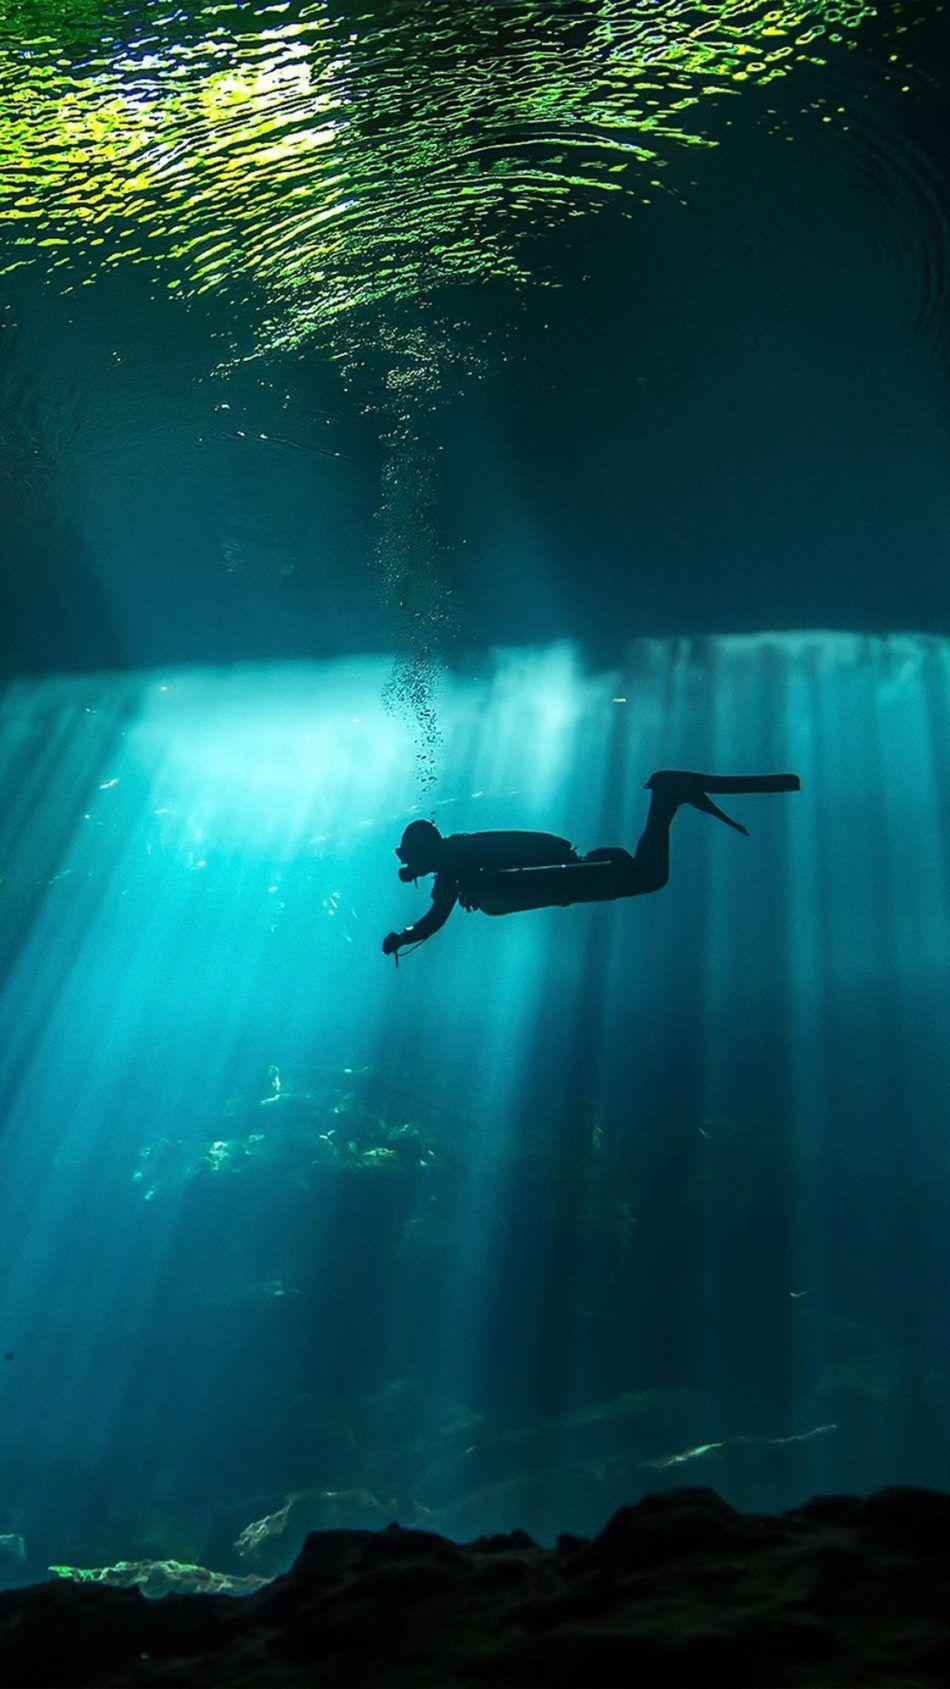 Scuba Diving Wallpaper Phone 950x1689 Wallpaper Teahub Io